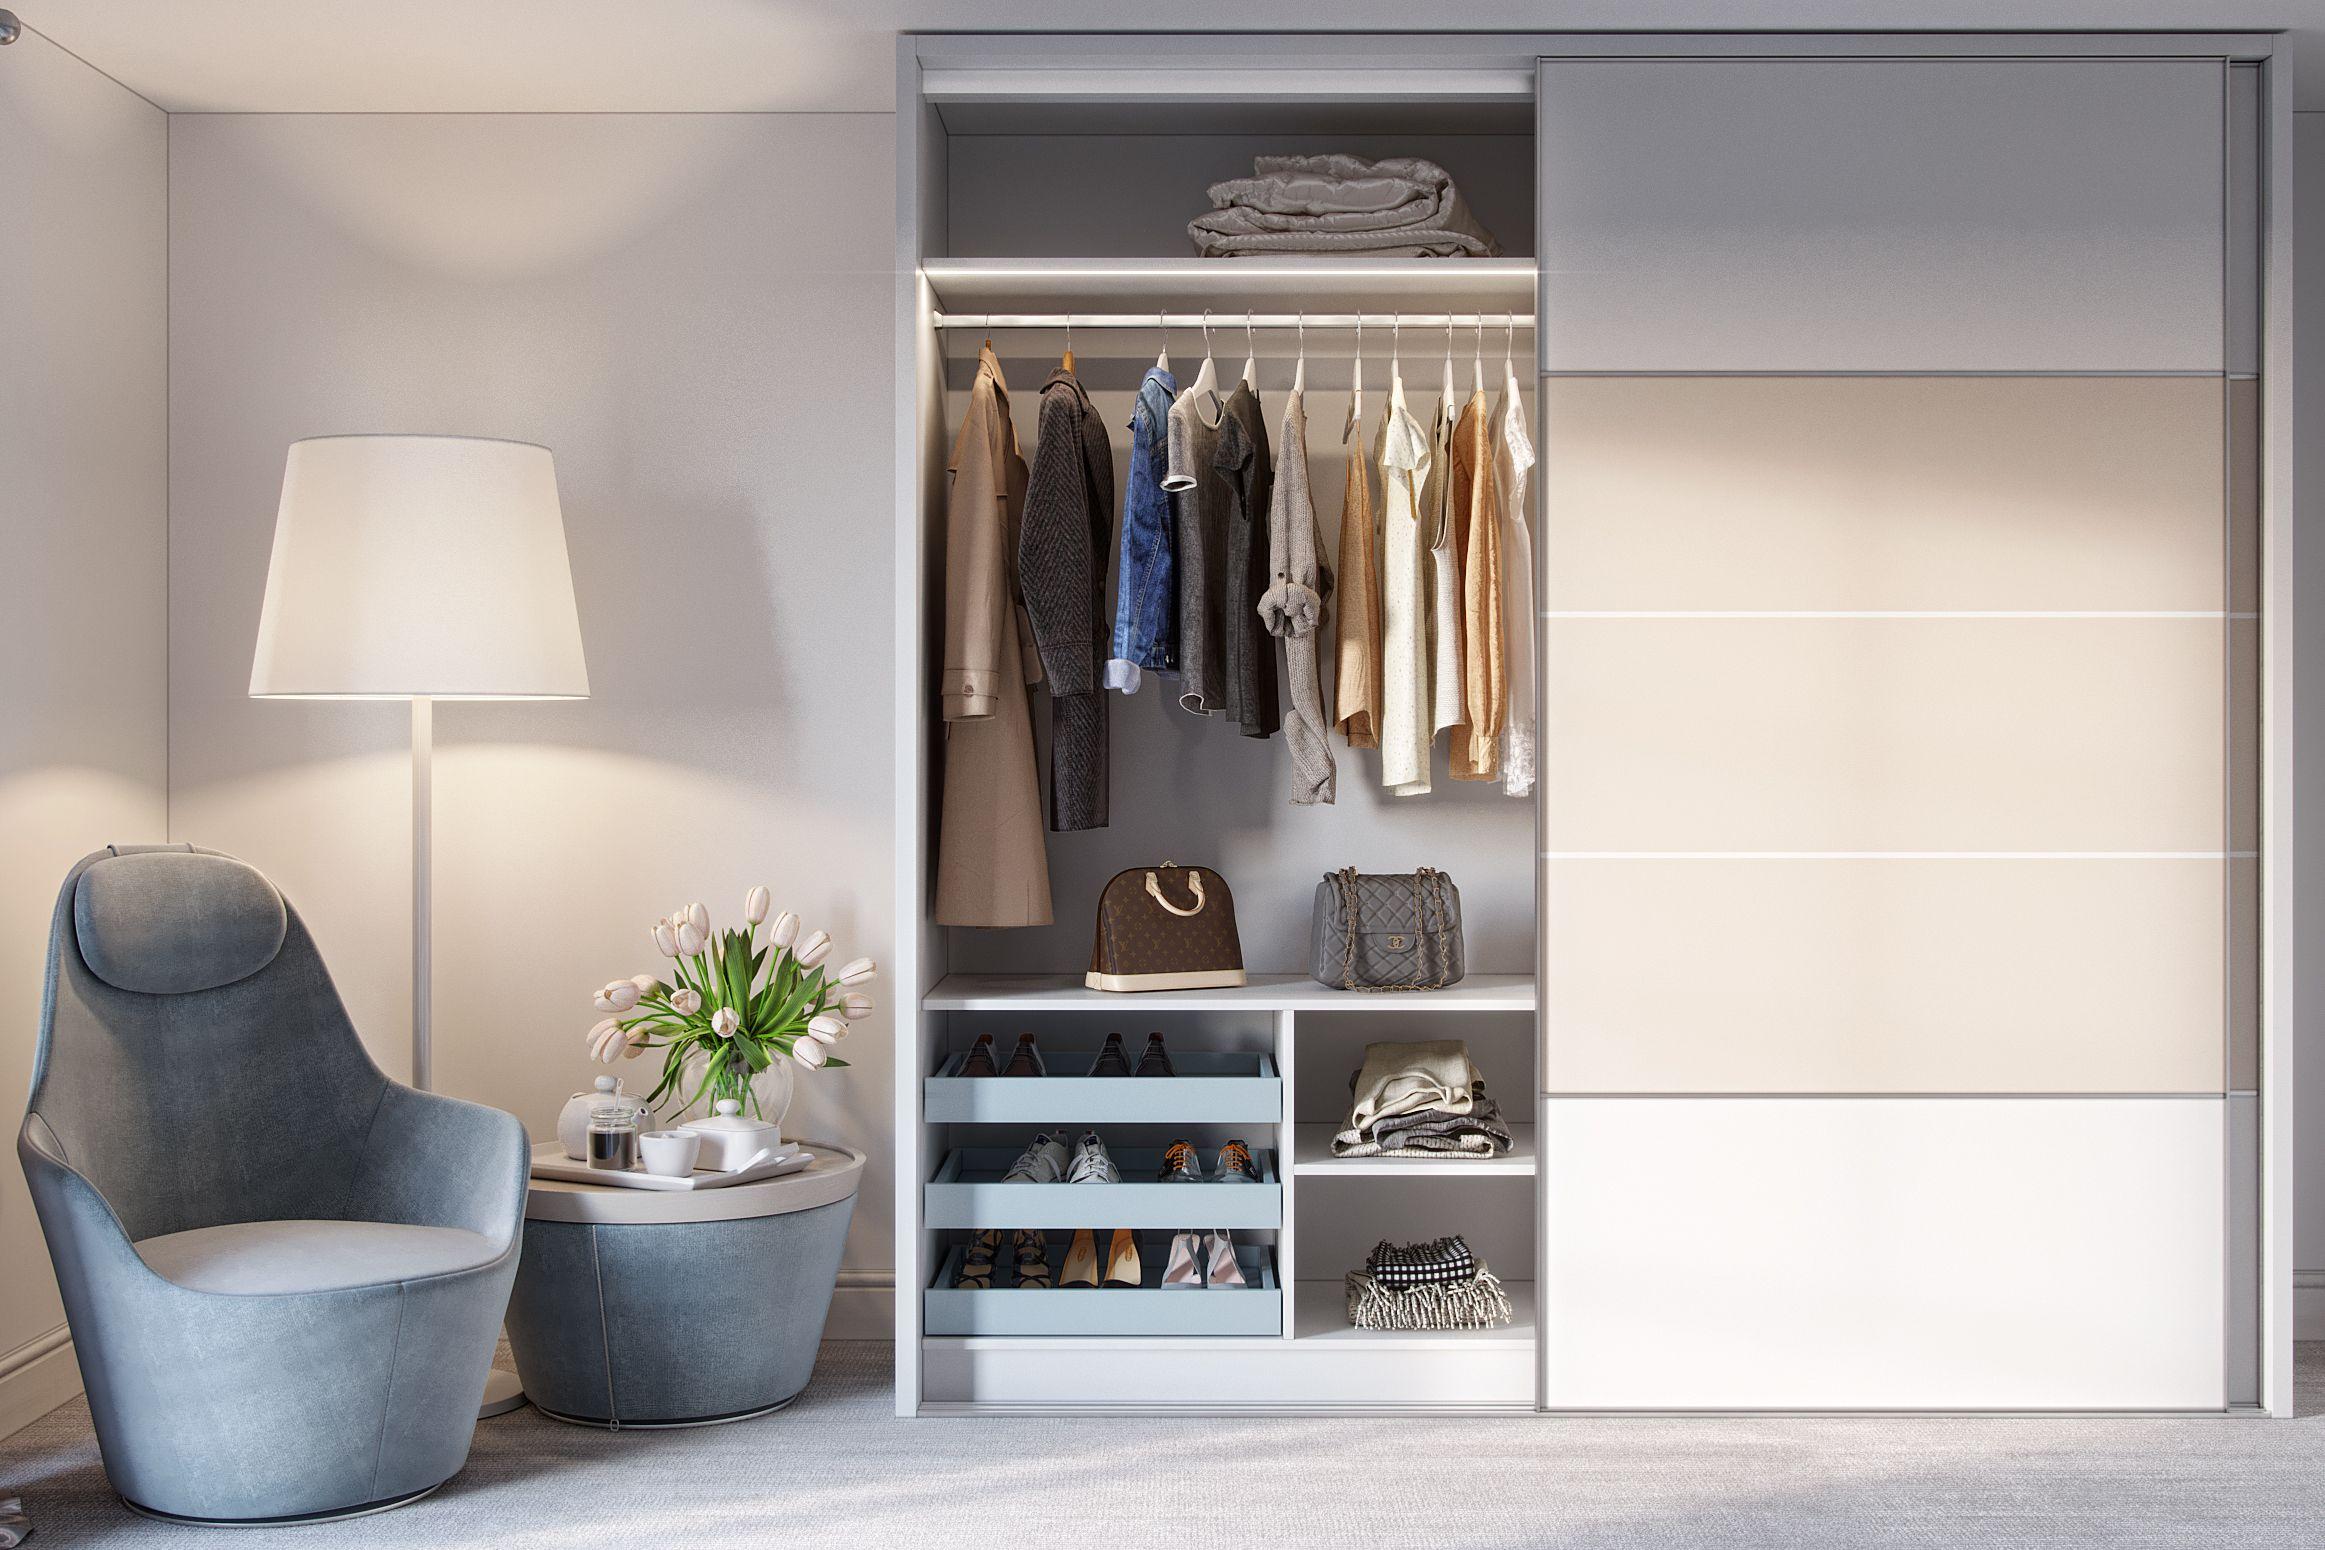 Fitted Sliding Door Wardrobe By Kleiderhaus Ltd For More Info